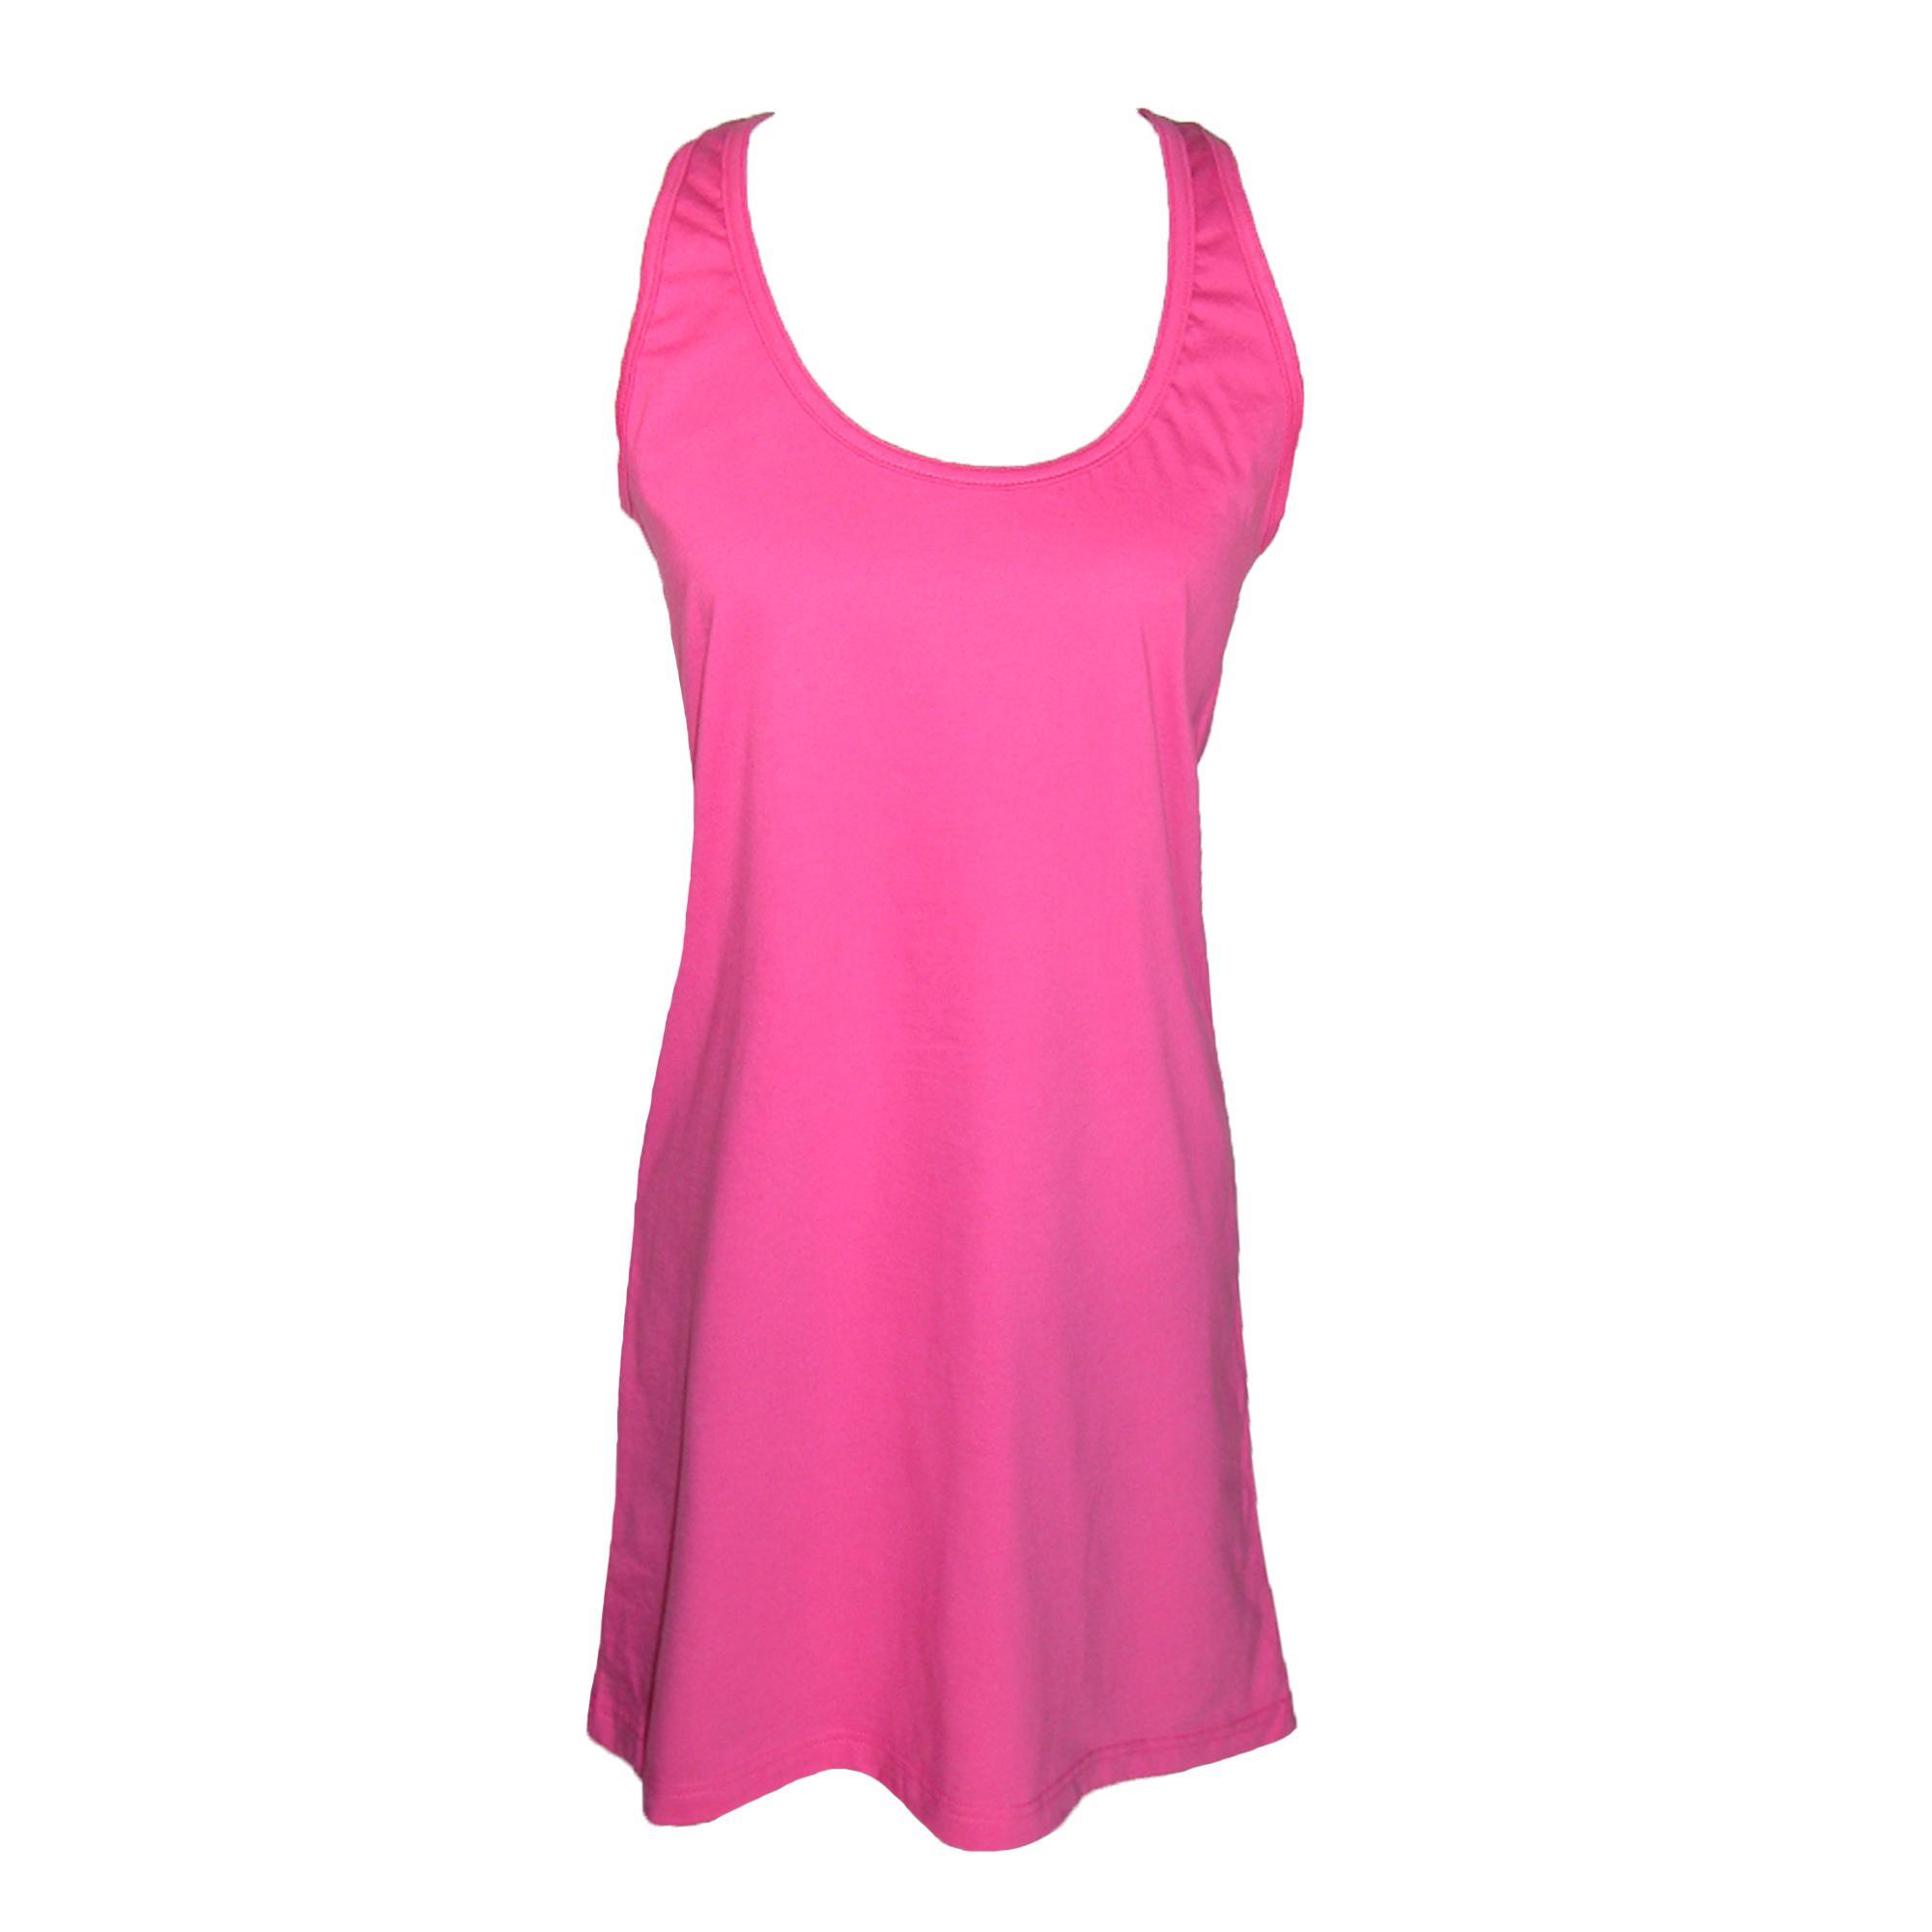 New boxercraft women 39 s cotton pajama sleep tank and cover for Women s flannel sleep shirt